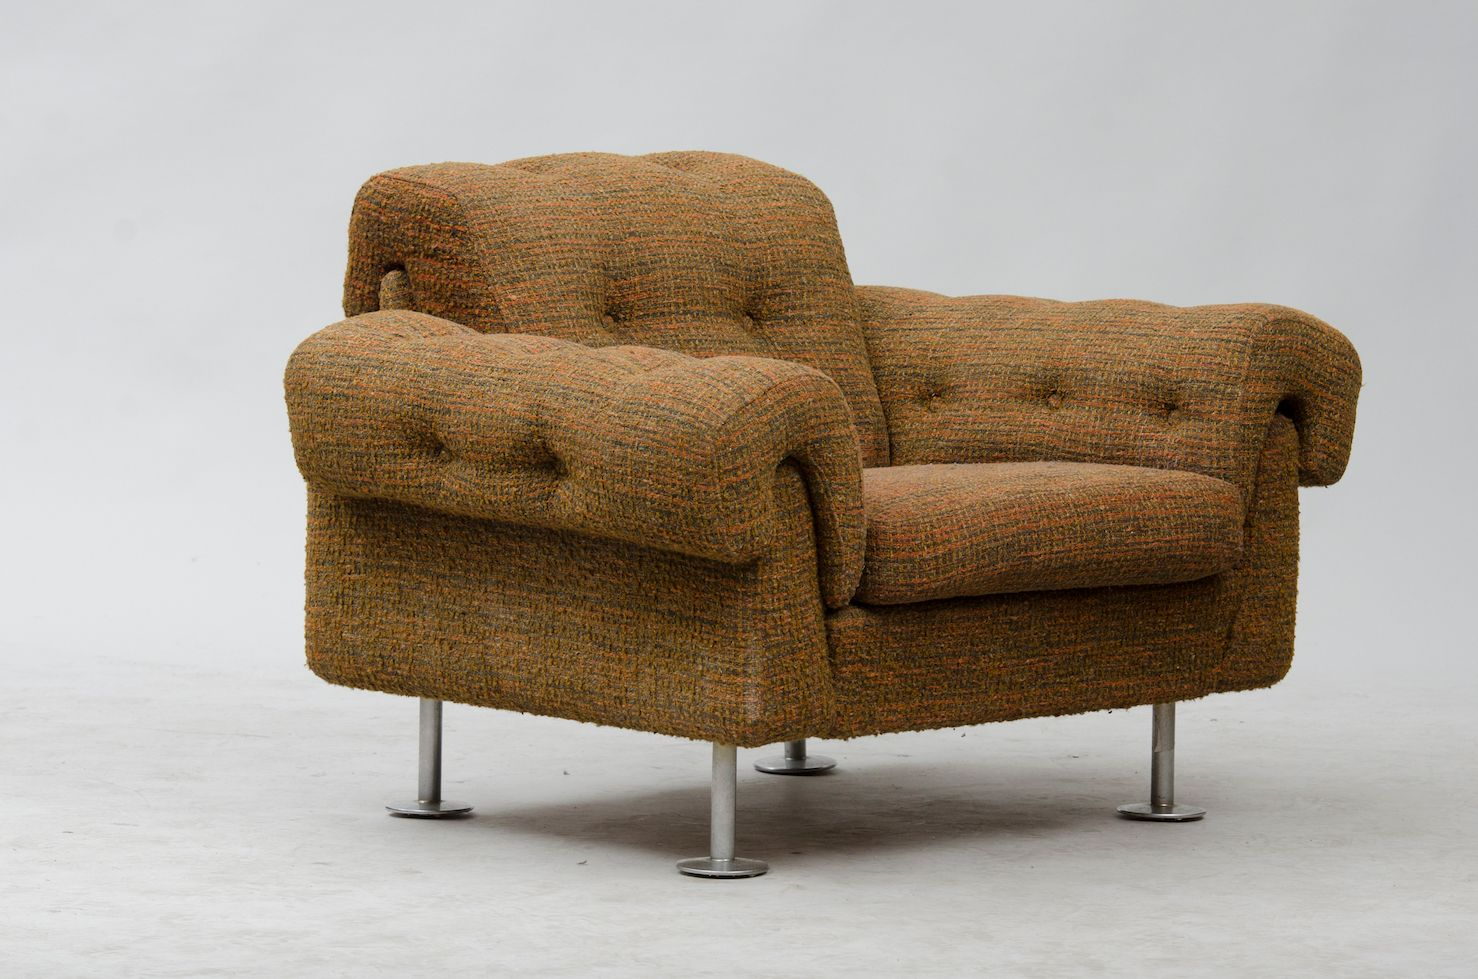 Vintage Sessel von Illum Wikkelsø